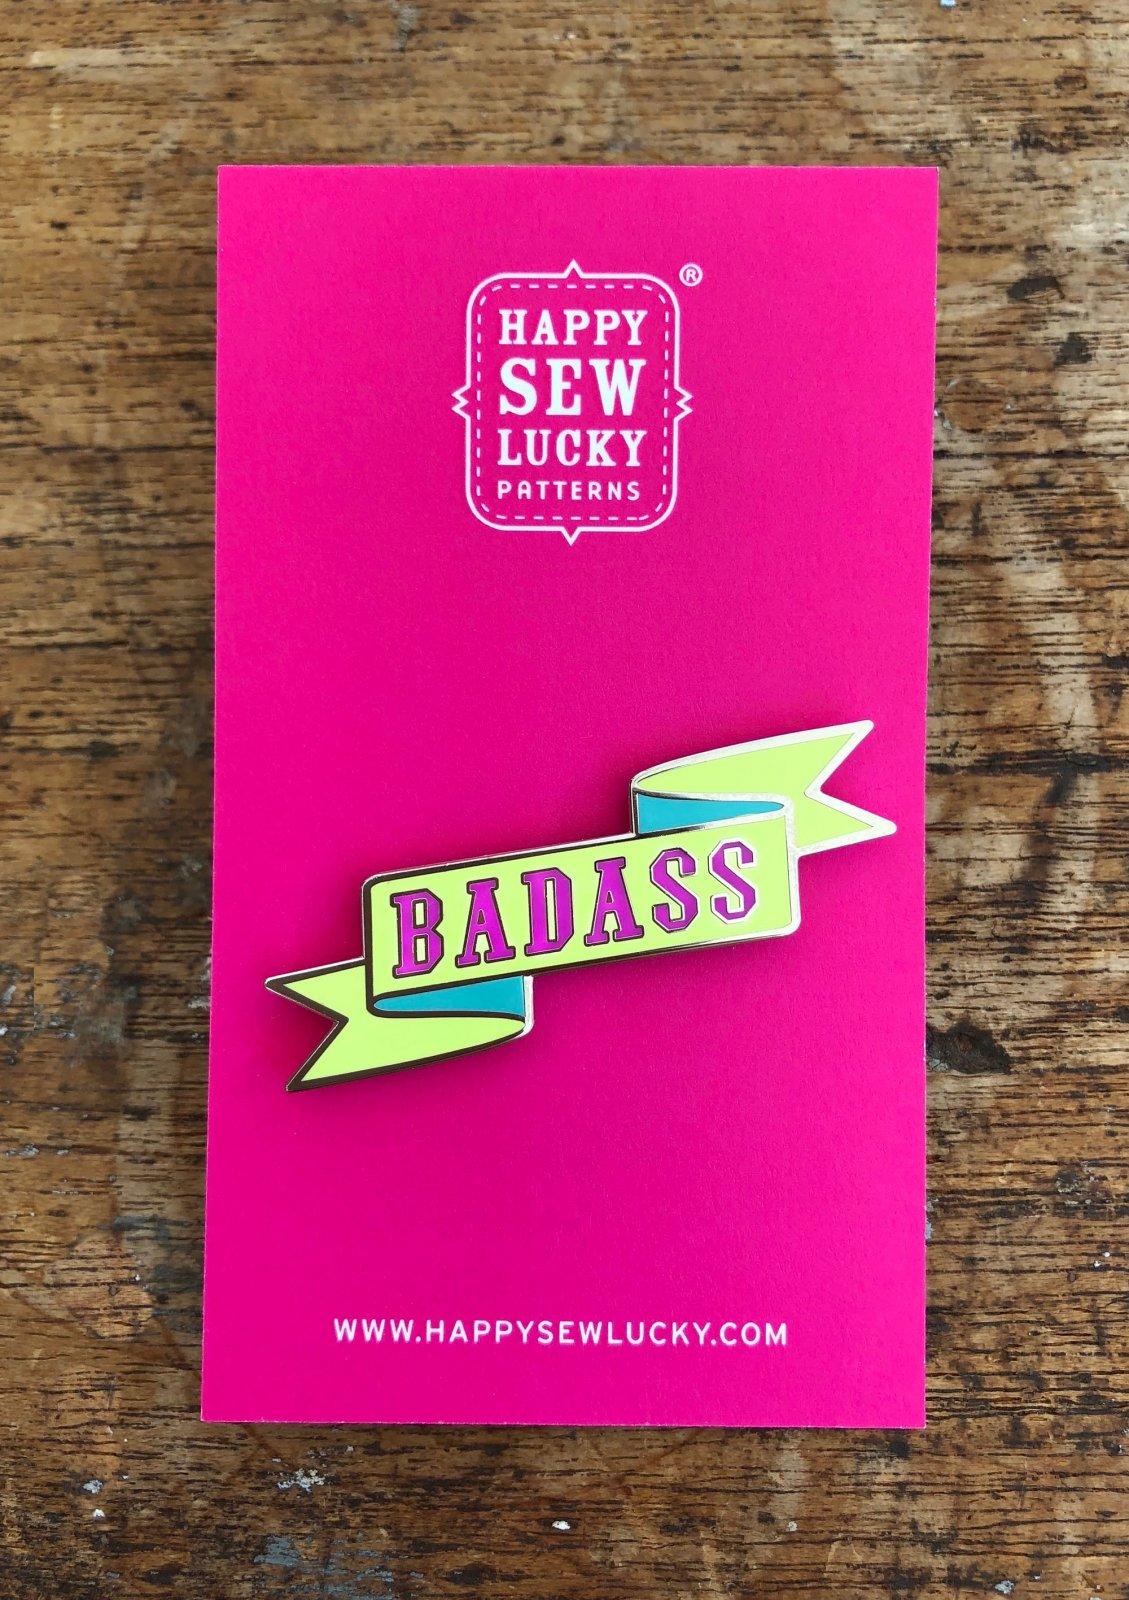 BADASS Enamel Pin by Happy Sew Lucky